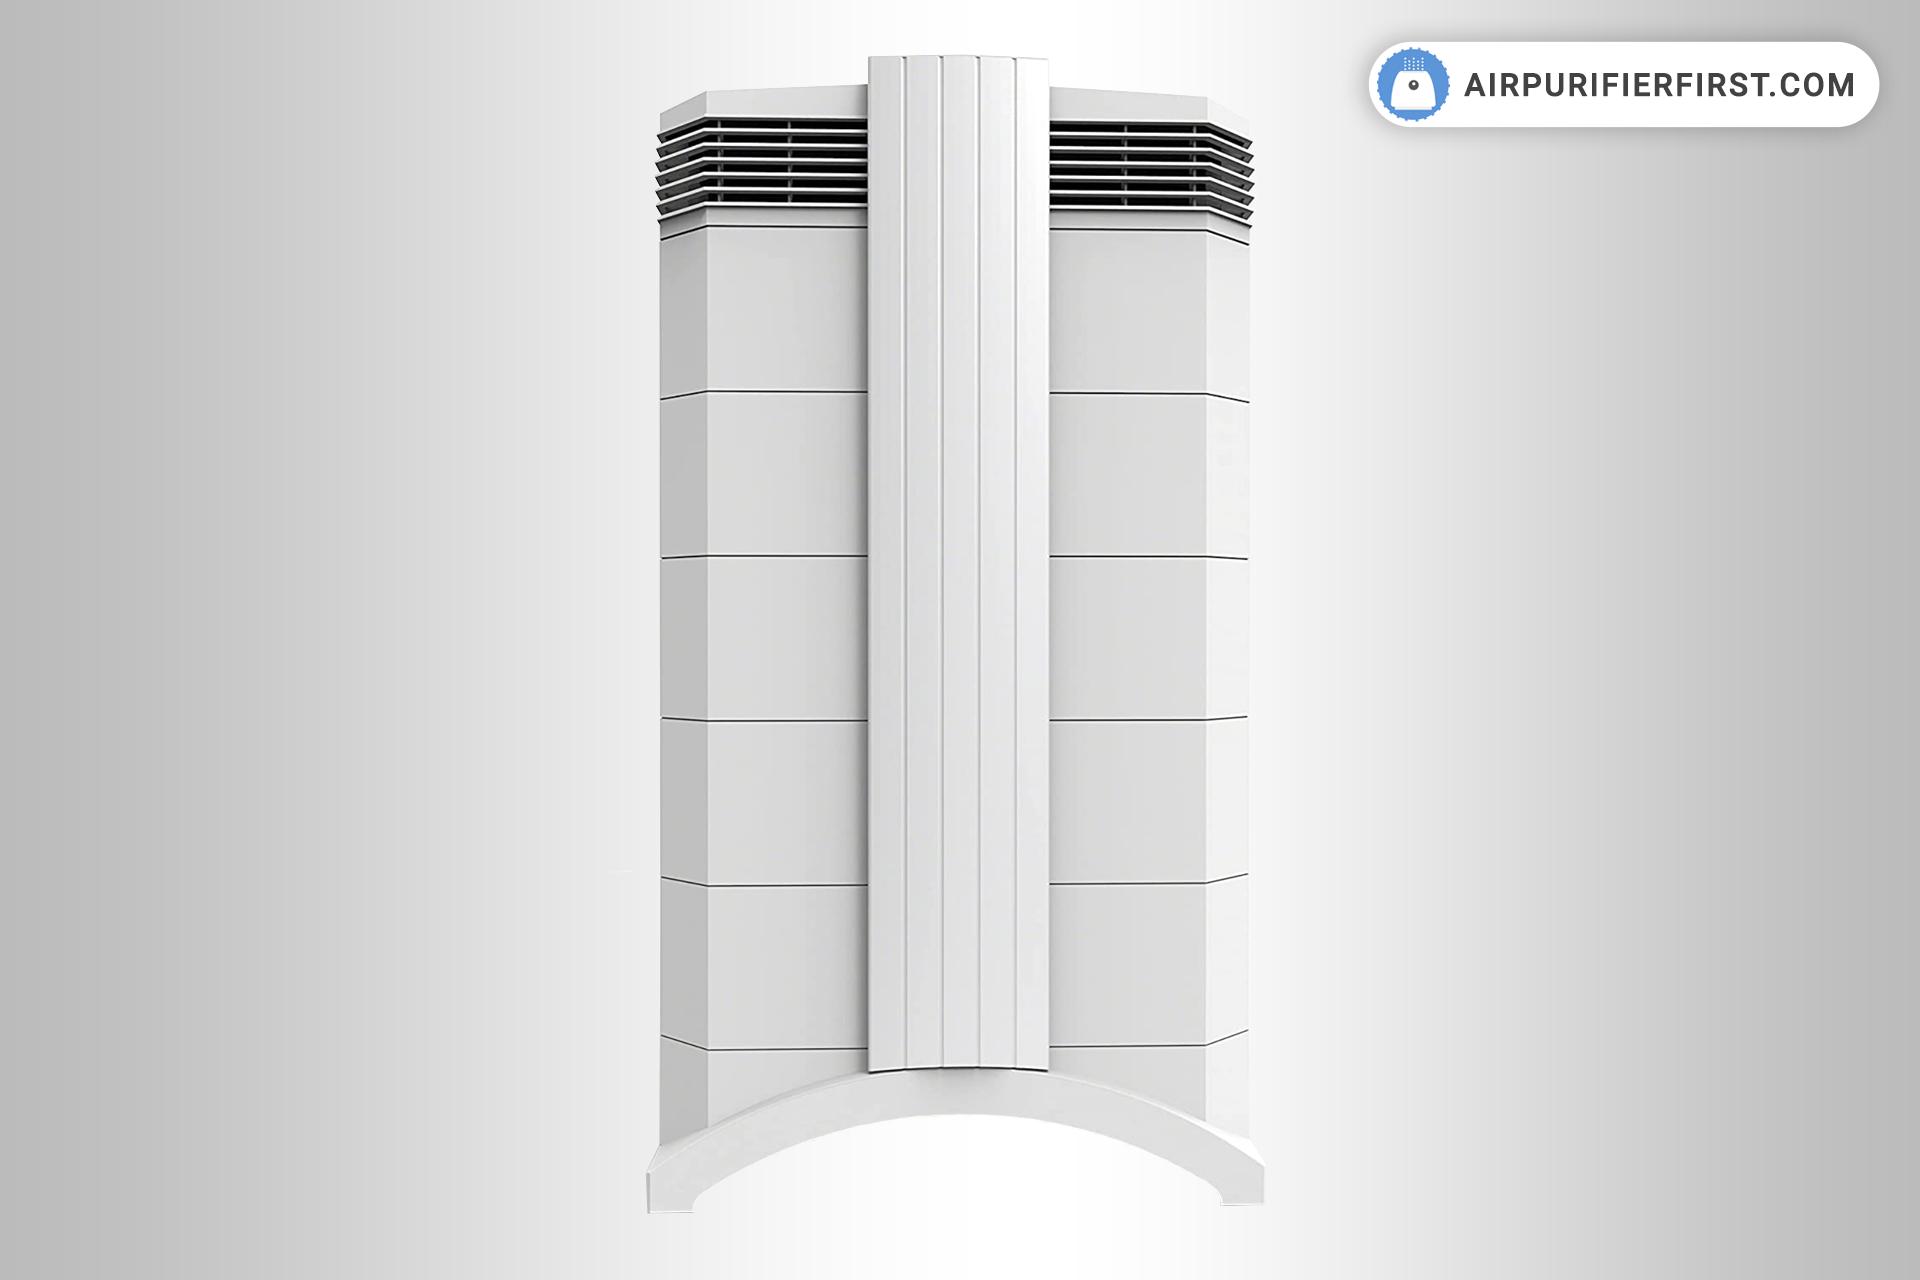 IQAir HealthPro Plus Air Purifier - Review